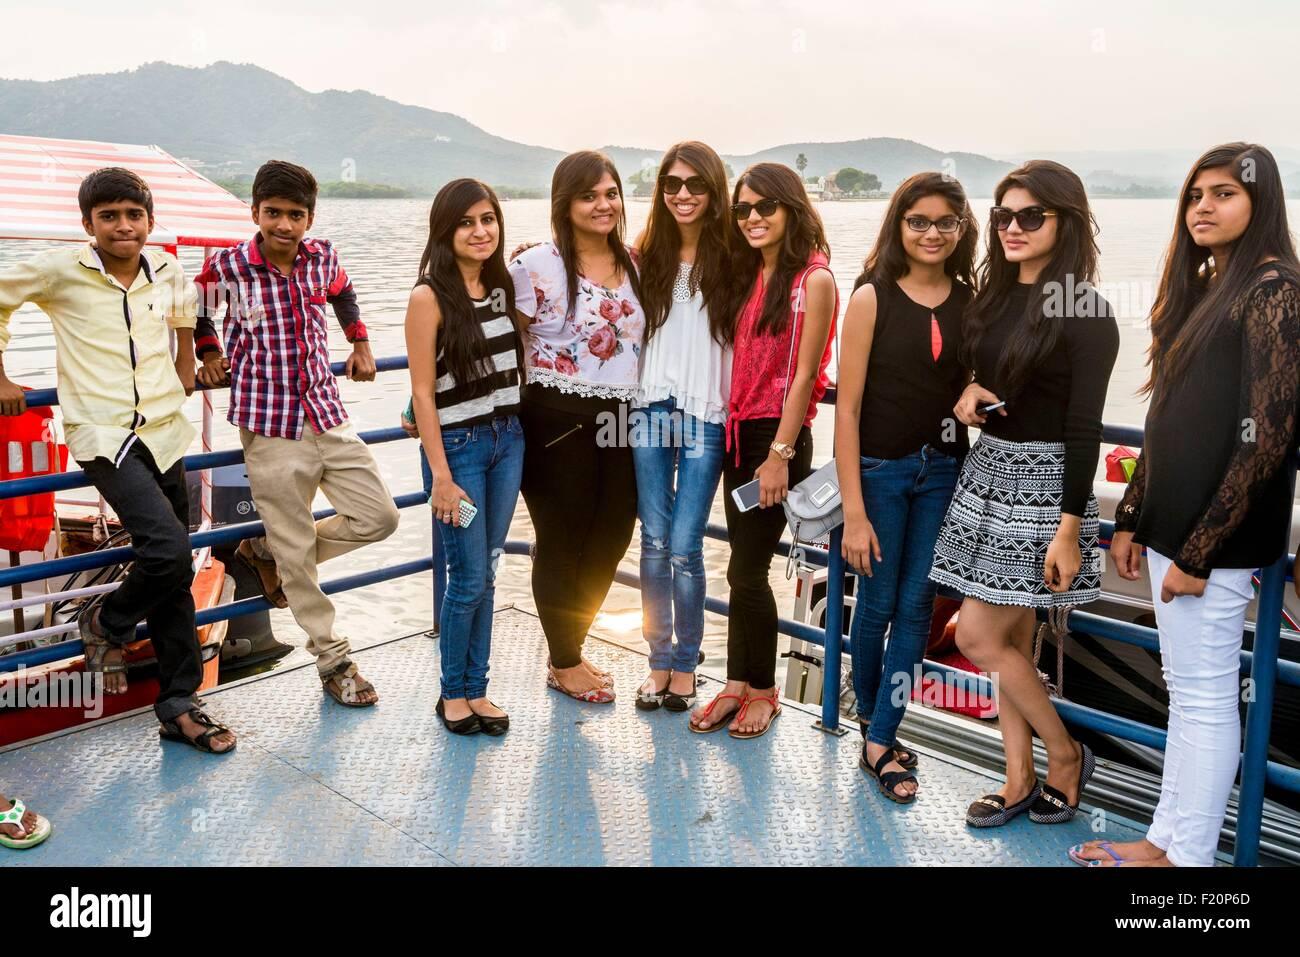 India, Rajasthan state, Udaipur, students visiting Lake Pichola - Stock Image